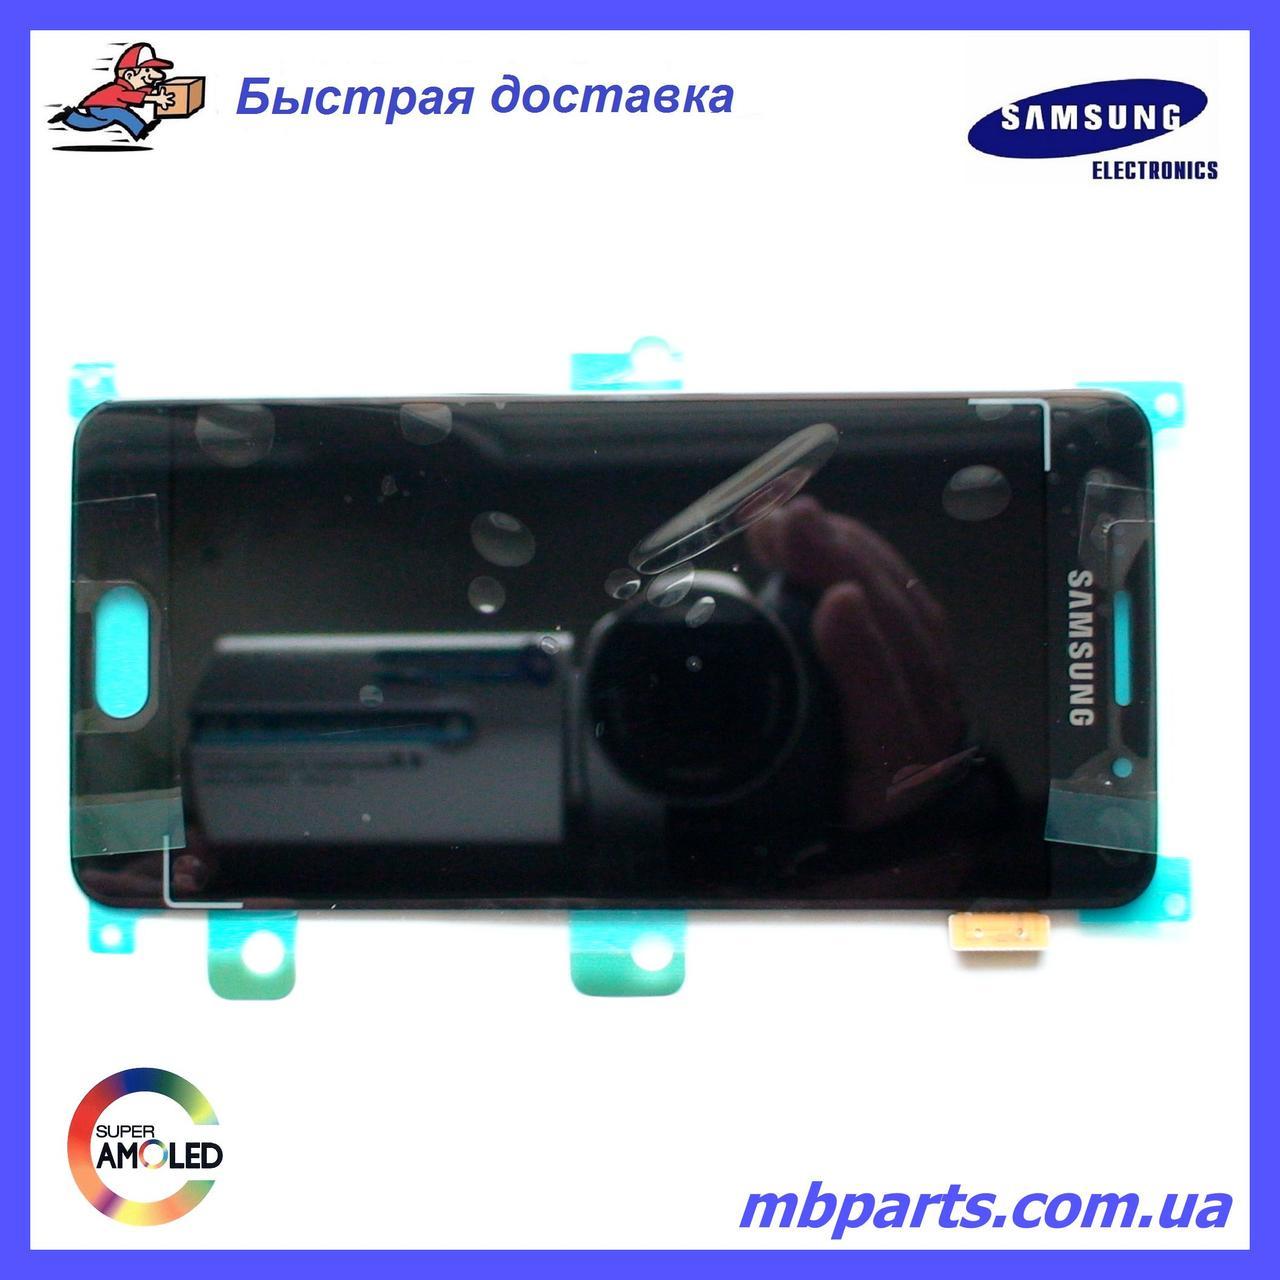 Дисплей с сенсором Samsung А310 Galaxy А3 Black оригинал, GH97-18249B